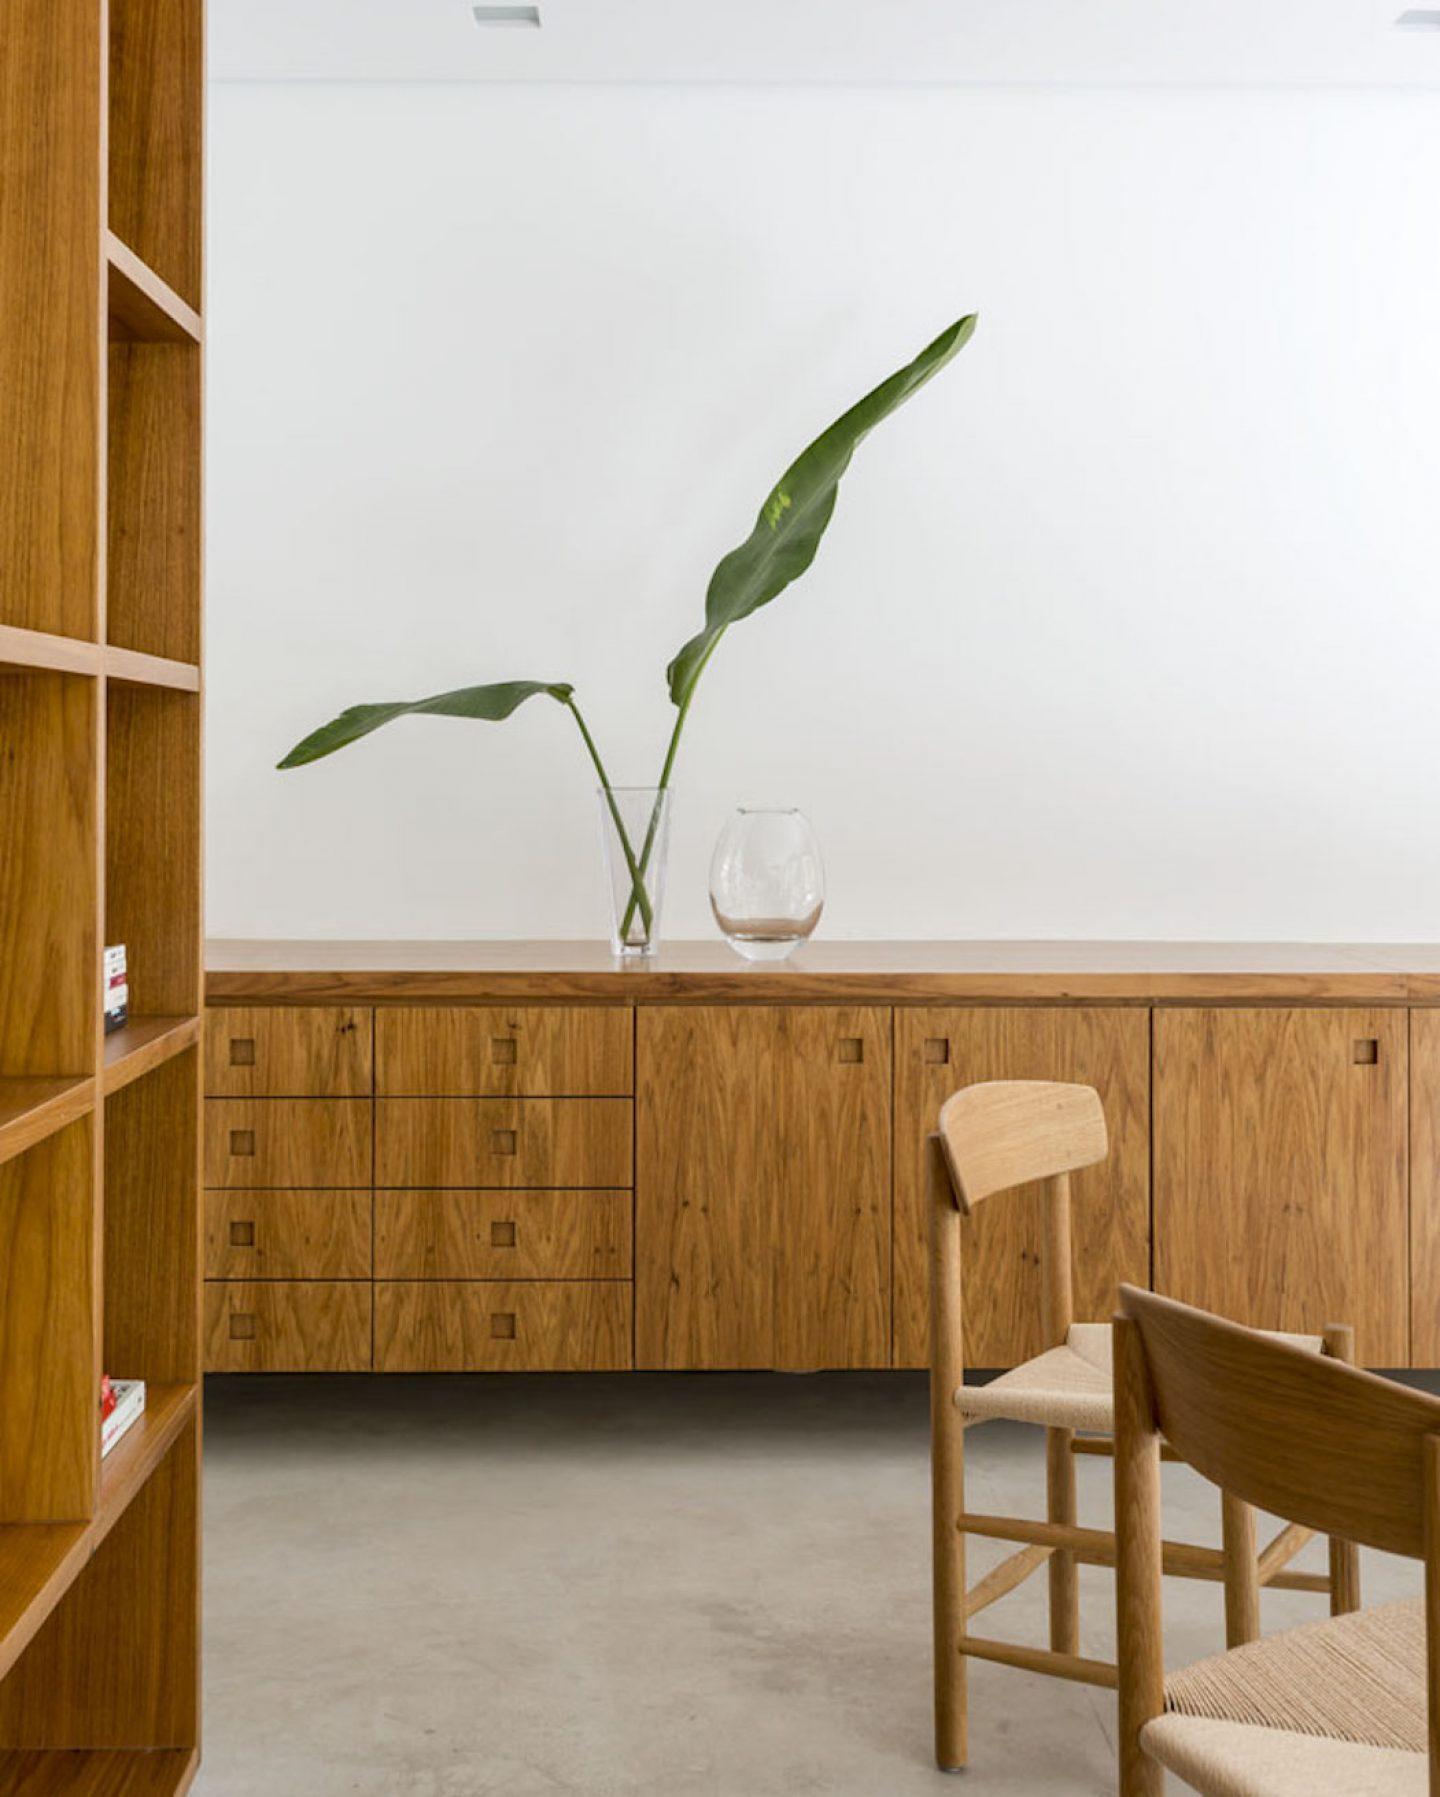 Felipe_Hess_Architecture_9482